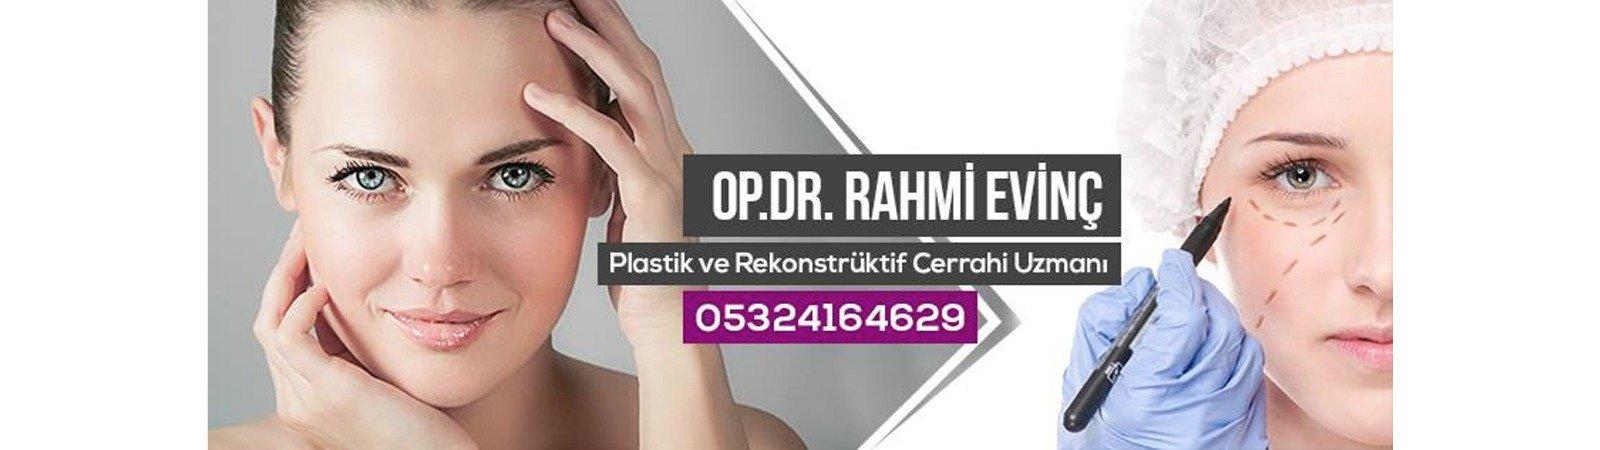 Op. Dr. Rahmi Evinç Galeri Foto